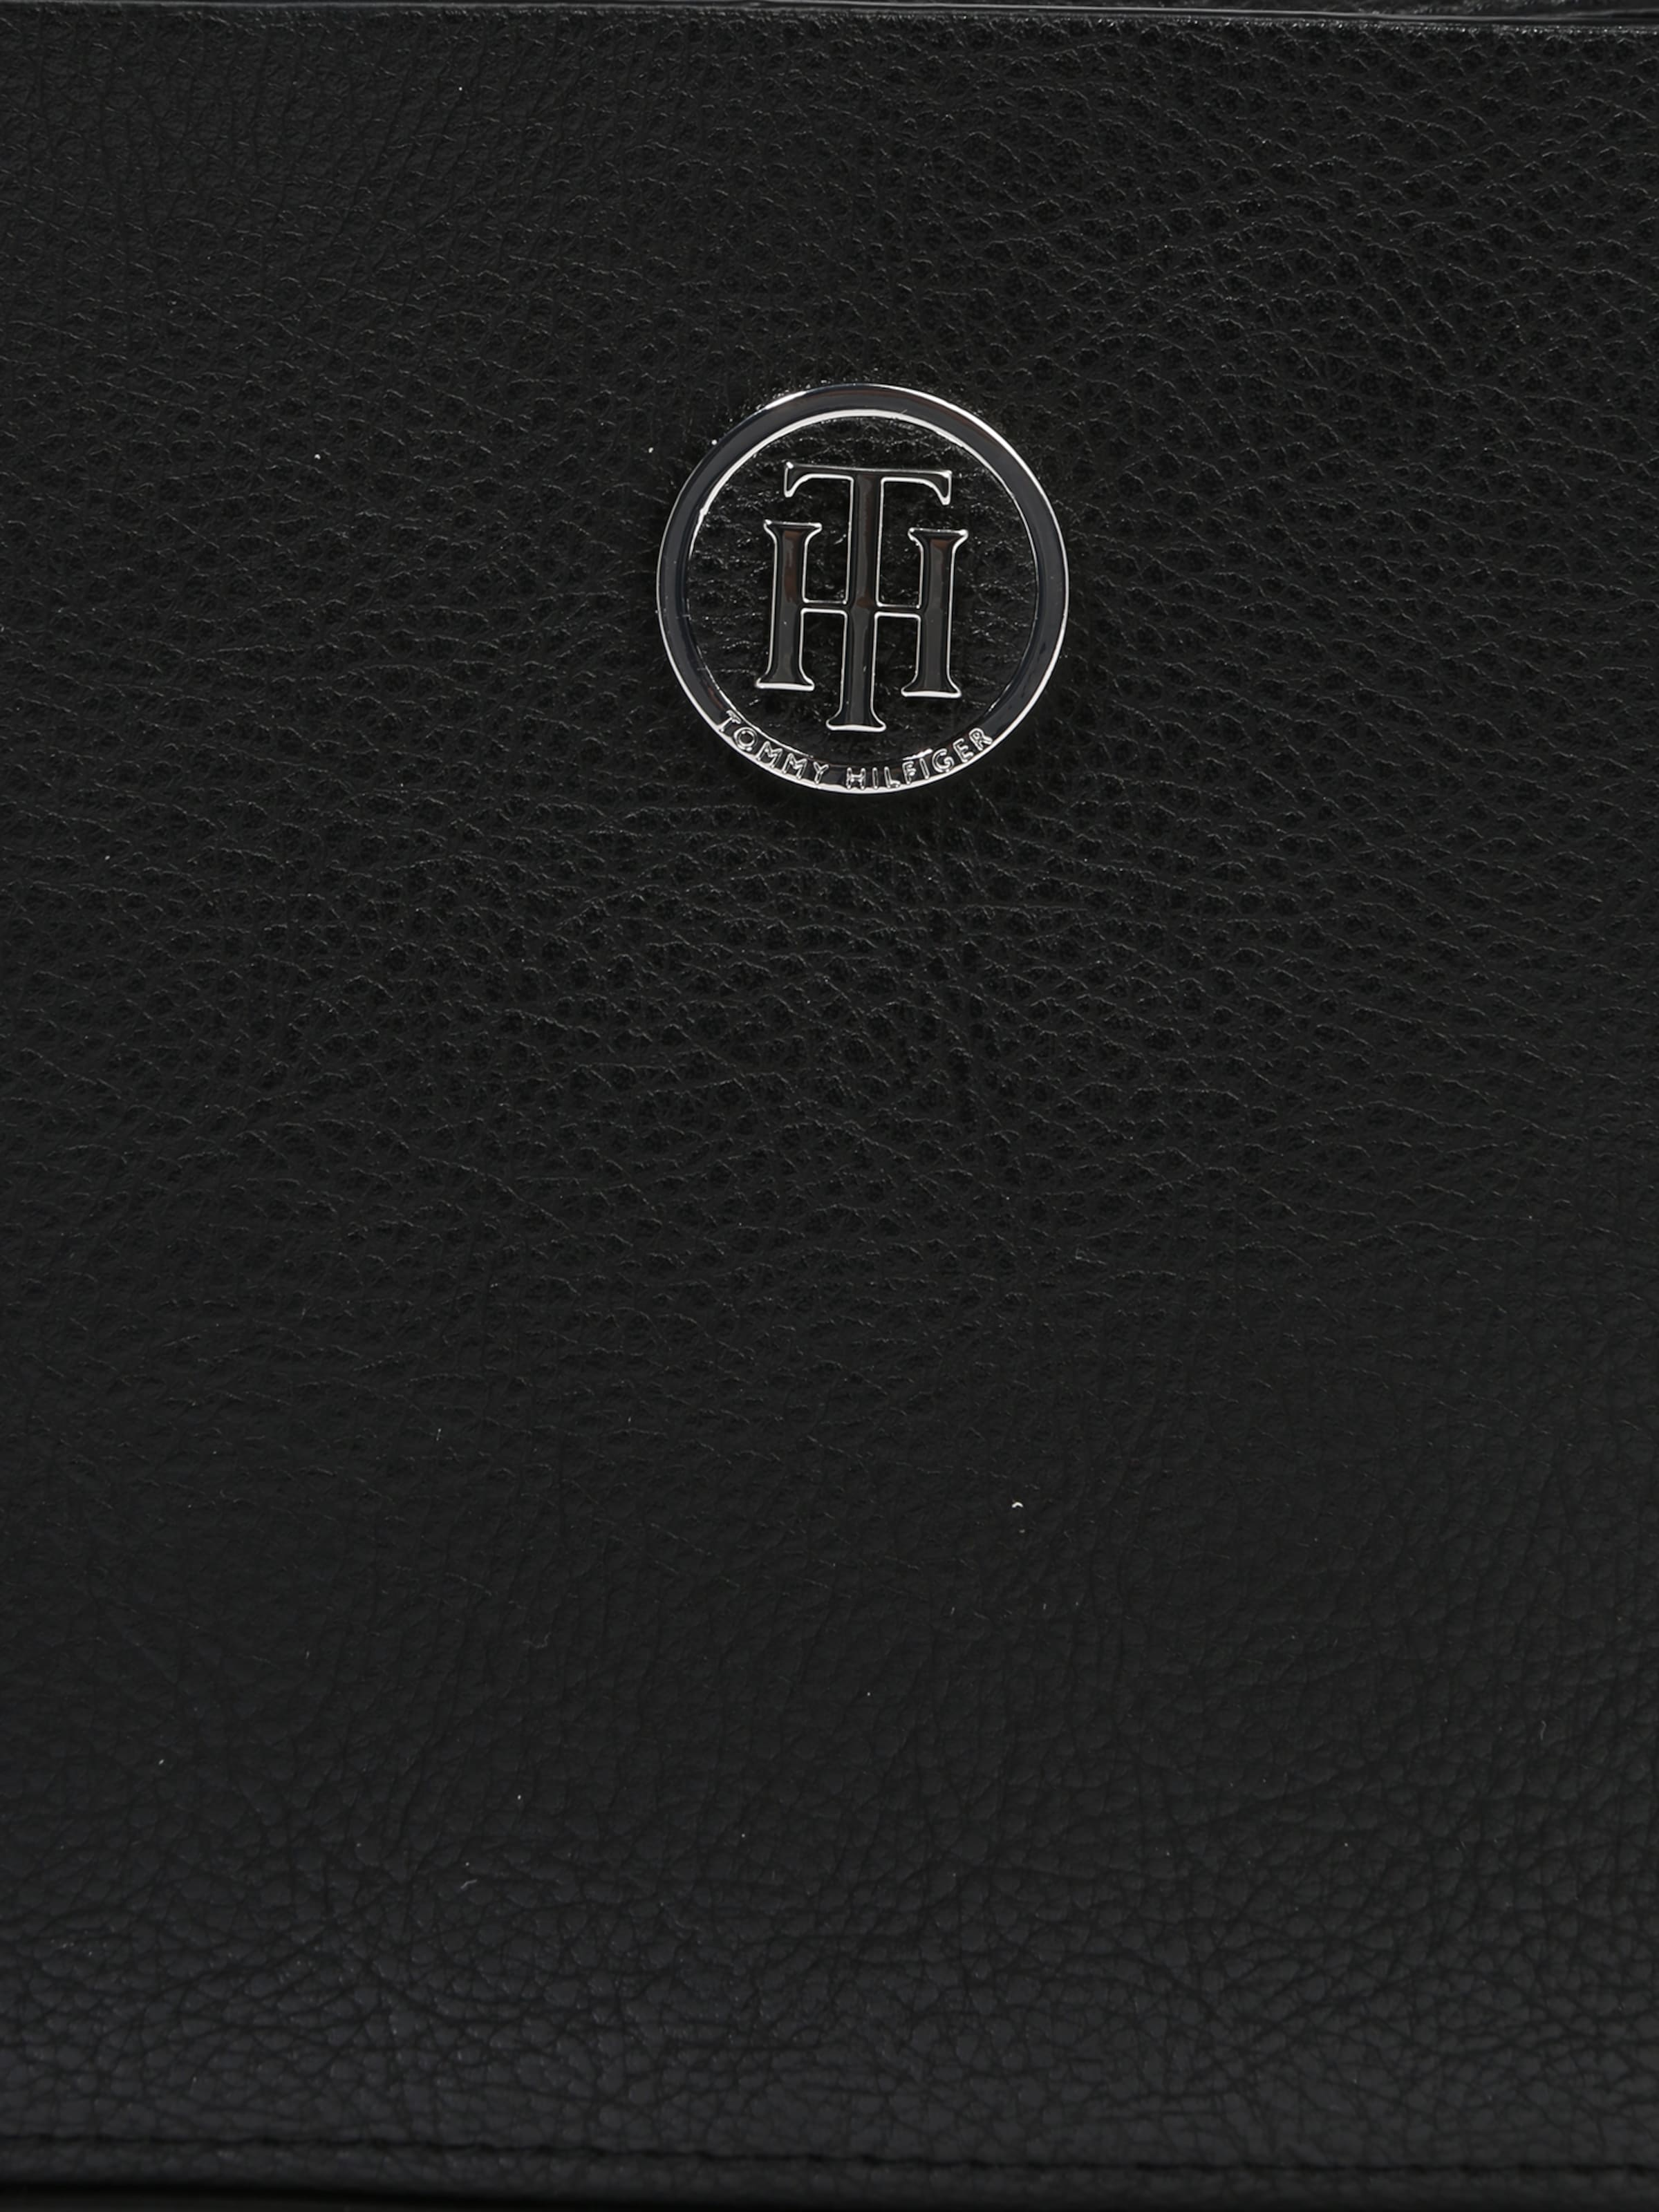 TOMMY HILFIGER Umhängetasche 'CORE CROSSOVER' Billig Verkauf 100% Garantiert Auslass Gut Verkaufen Auslass Freies Verschiffen Austrittsstellen Zum Verkauf Finden Große Günstig Online P6P8gKD